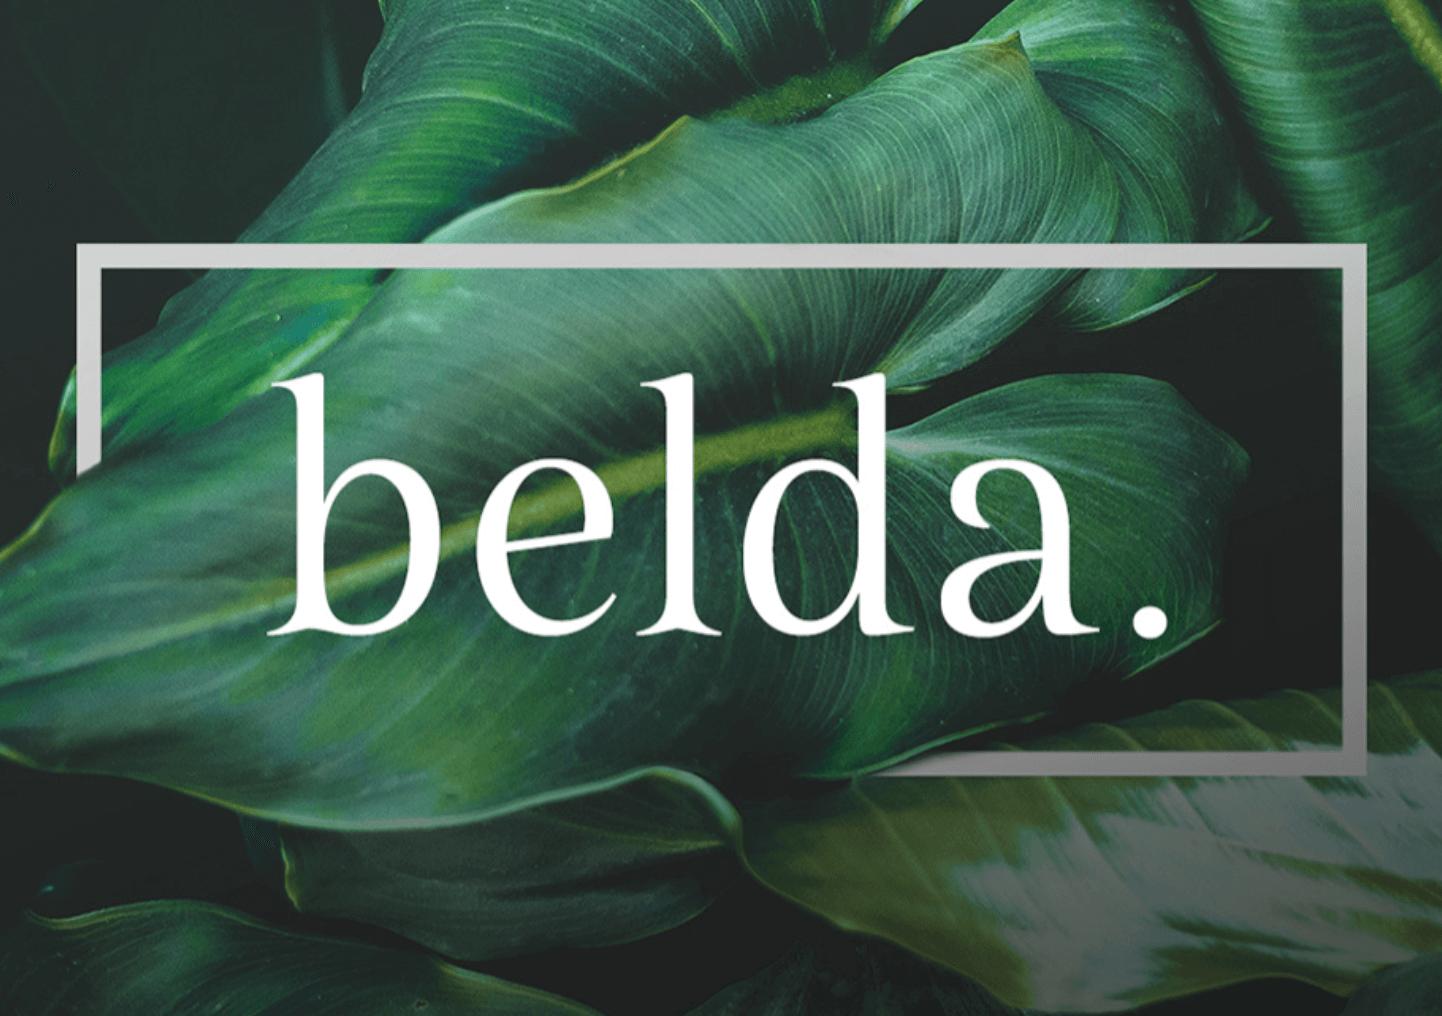 serif font for dyslexic person